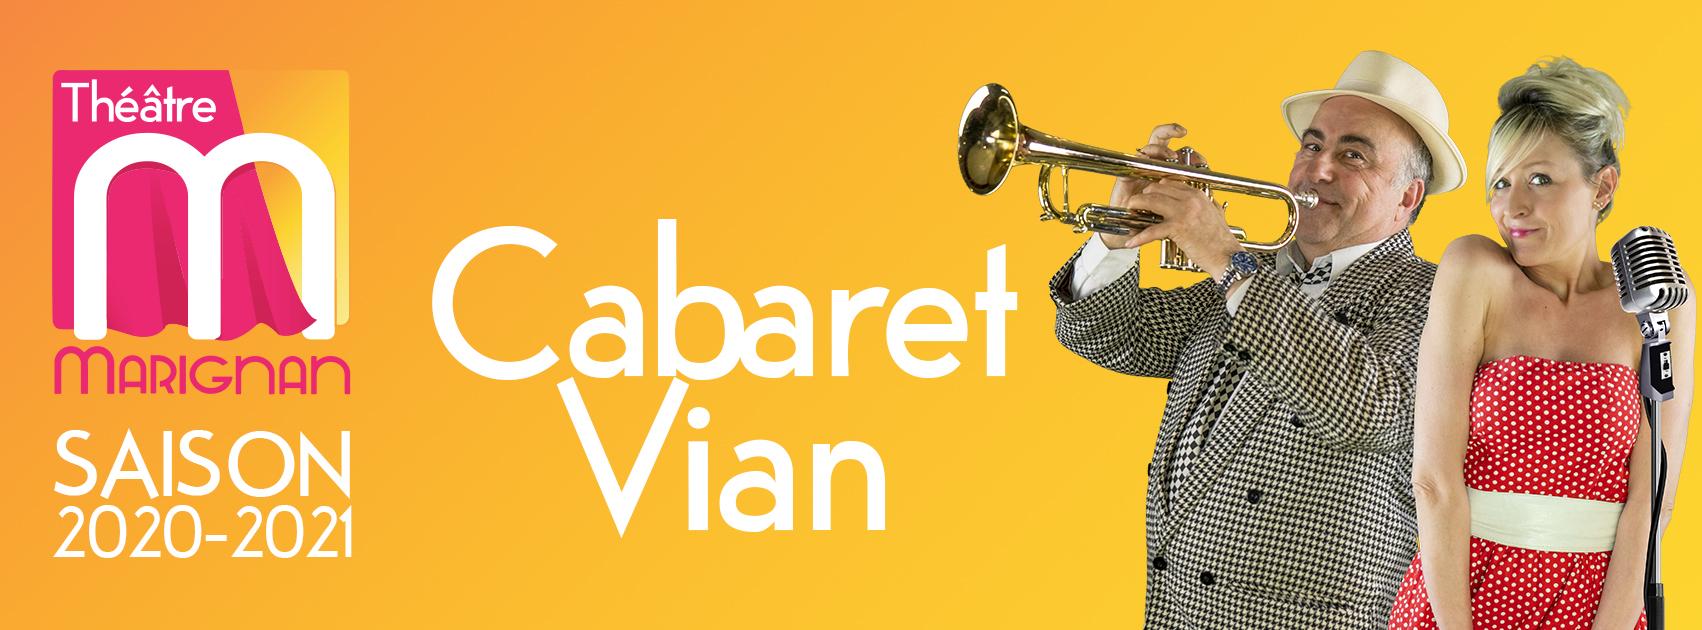 Cabaret Vian